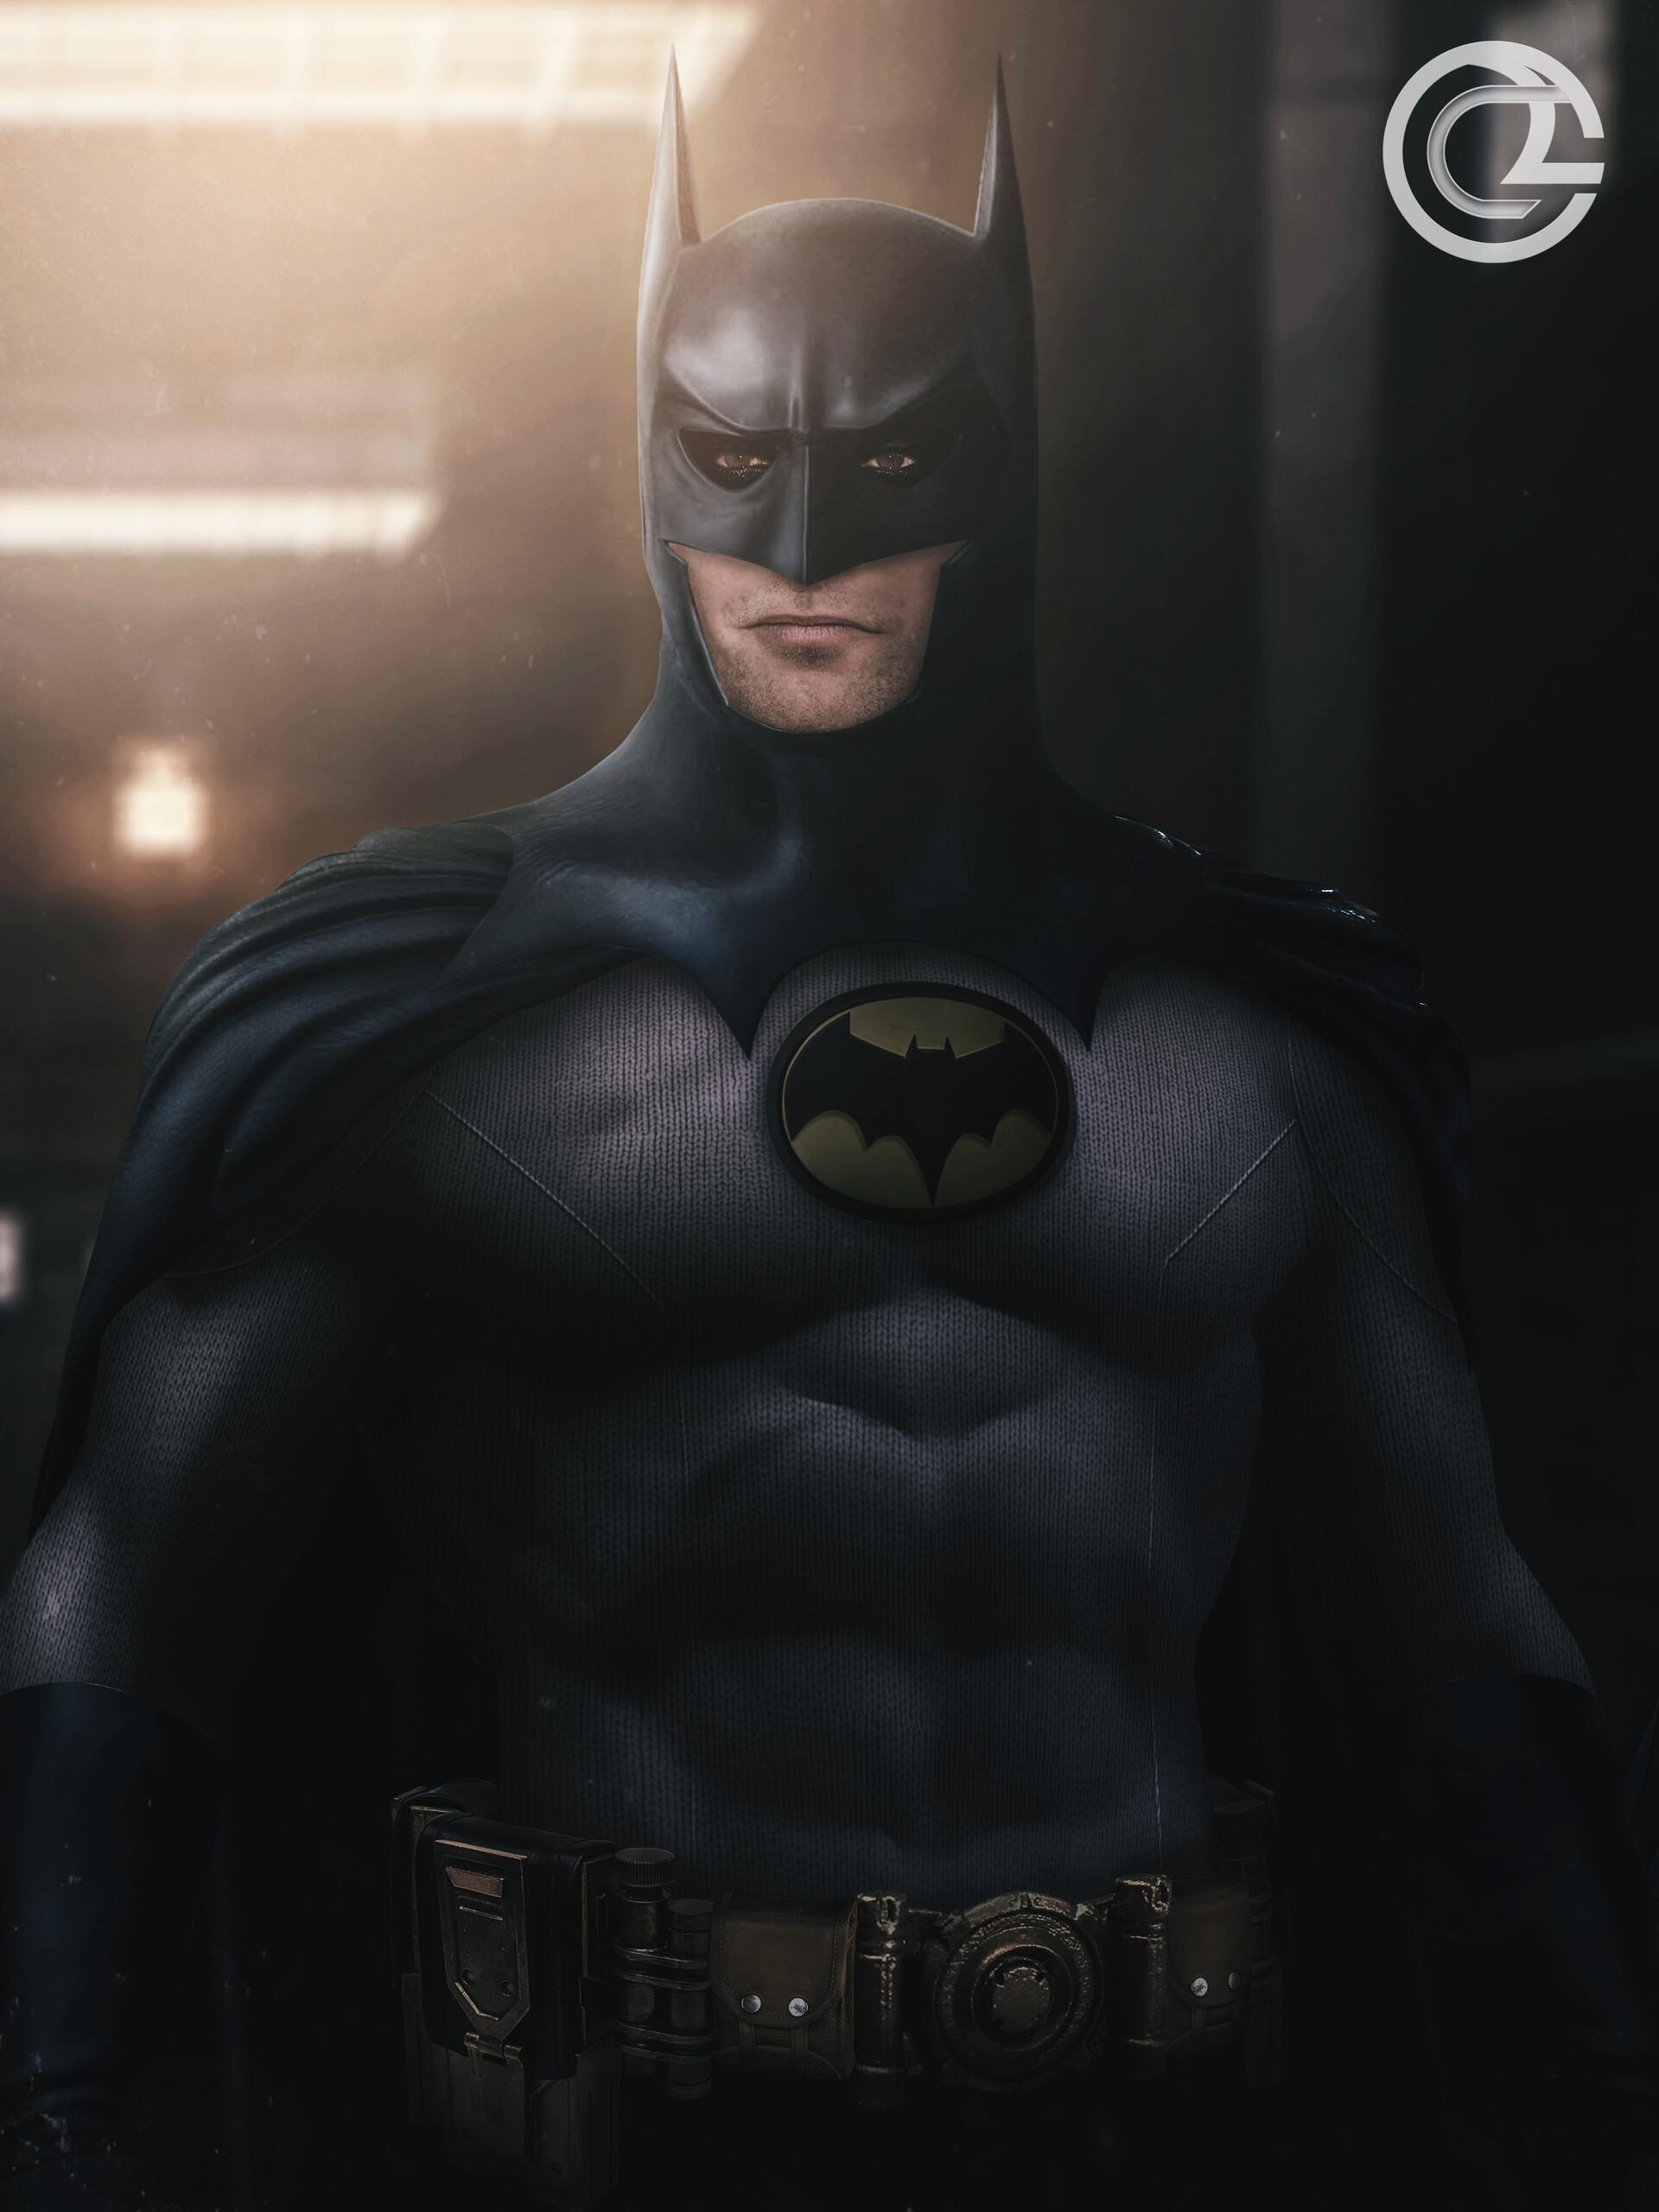 ArtStation - Pattinson Batman Suit Concept, Kunal Chopra